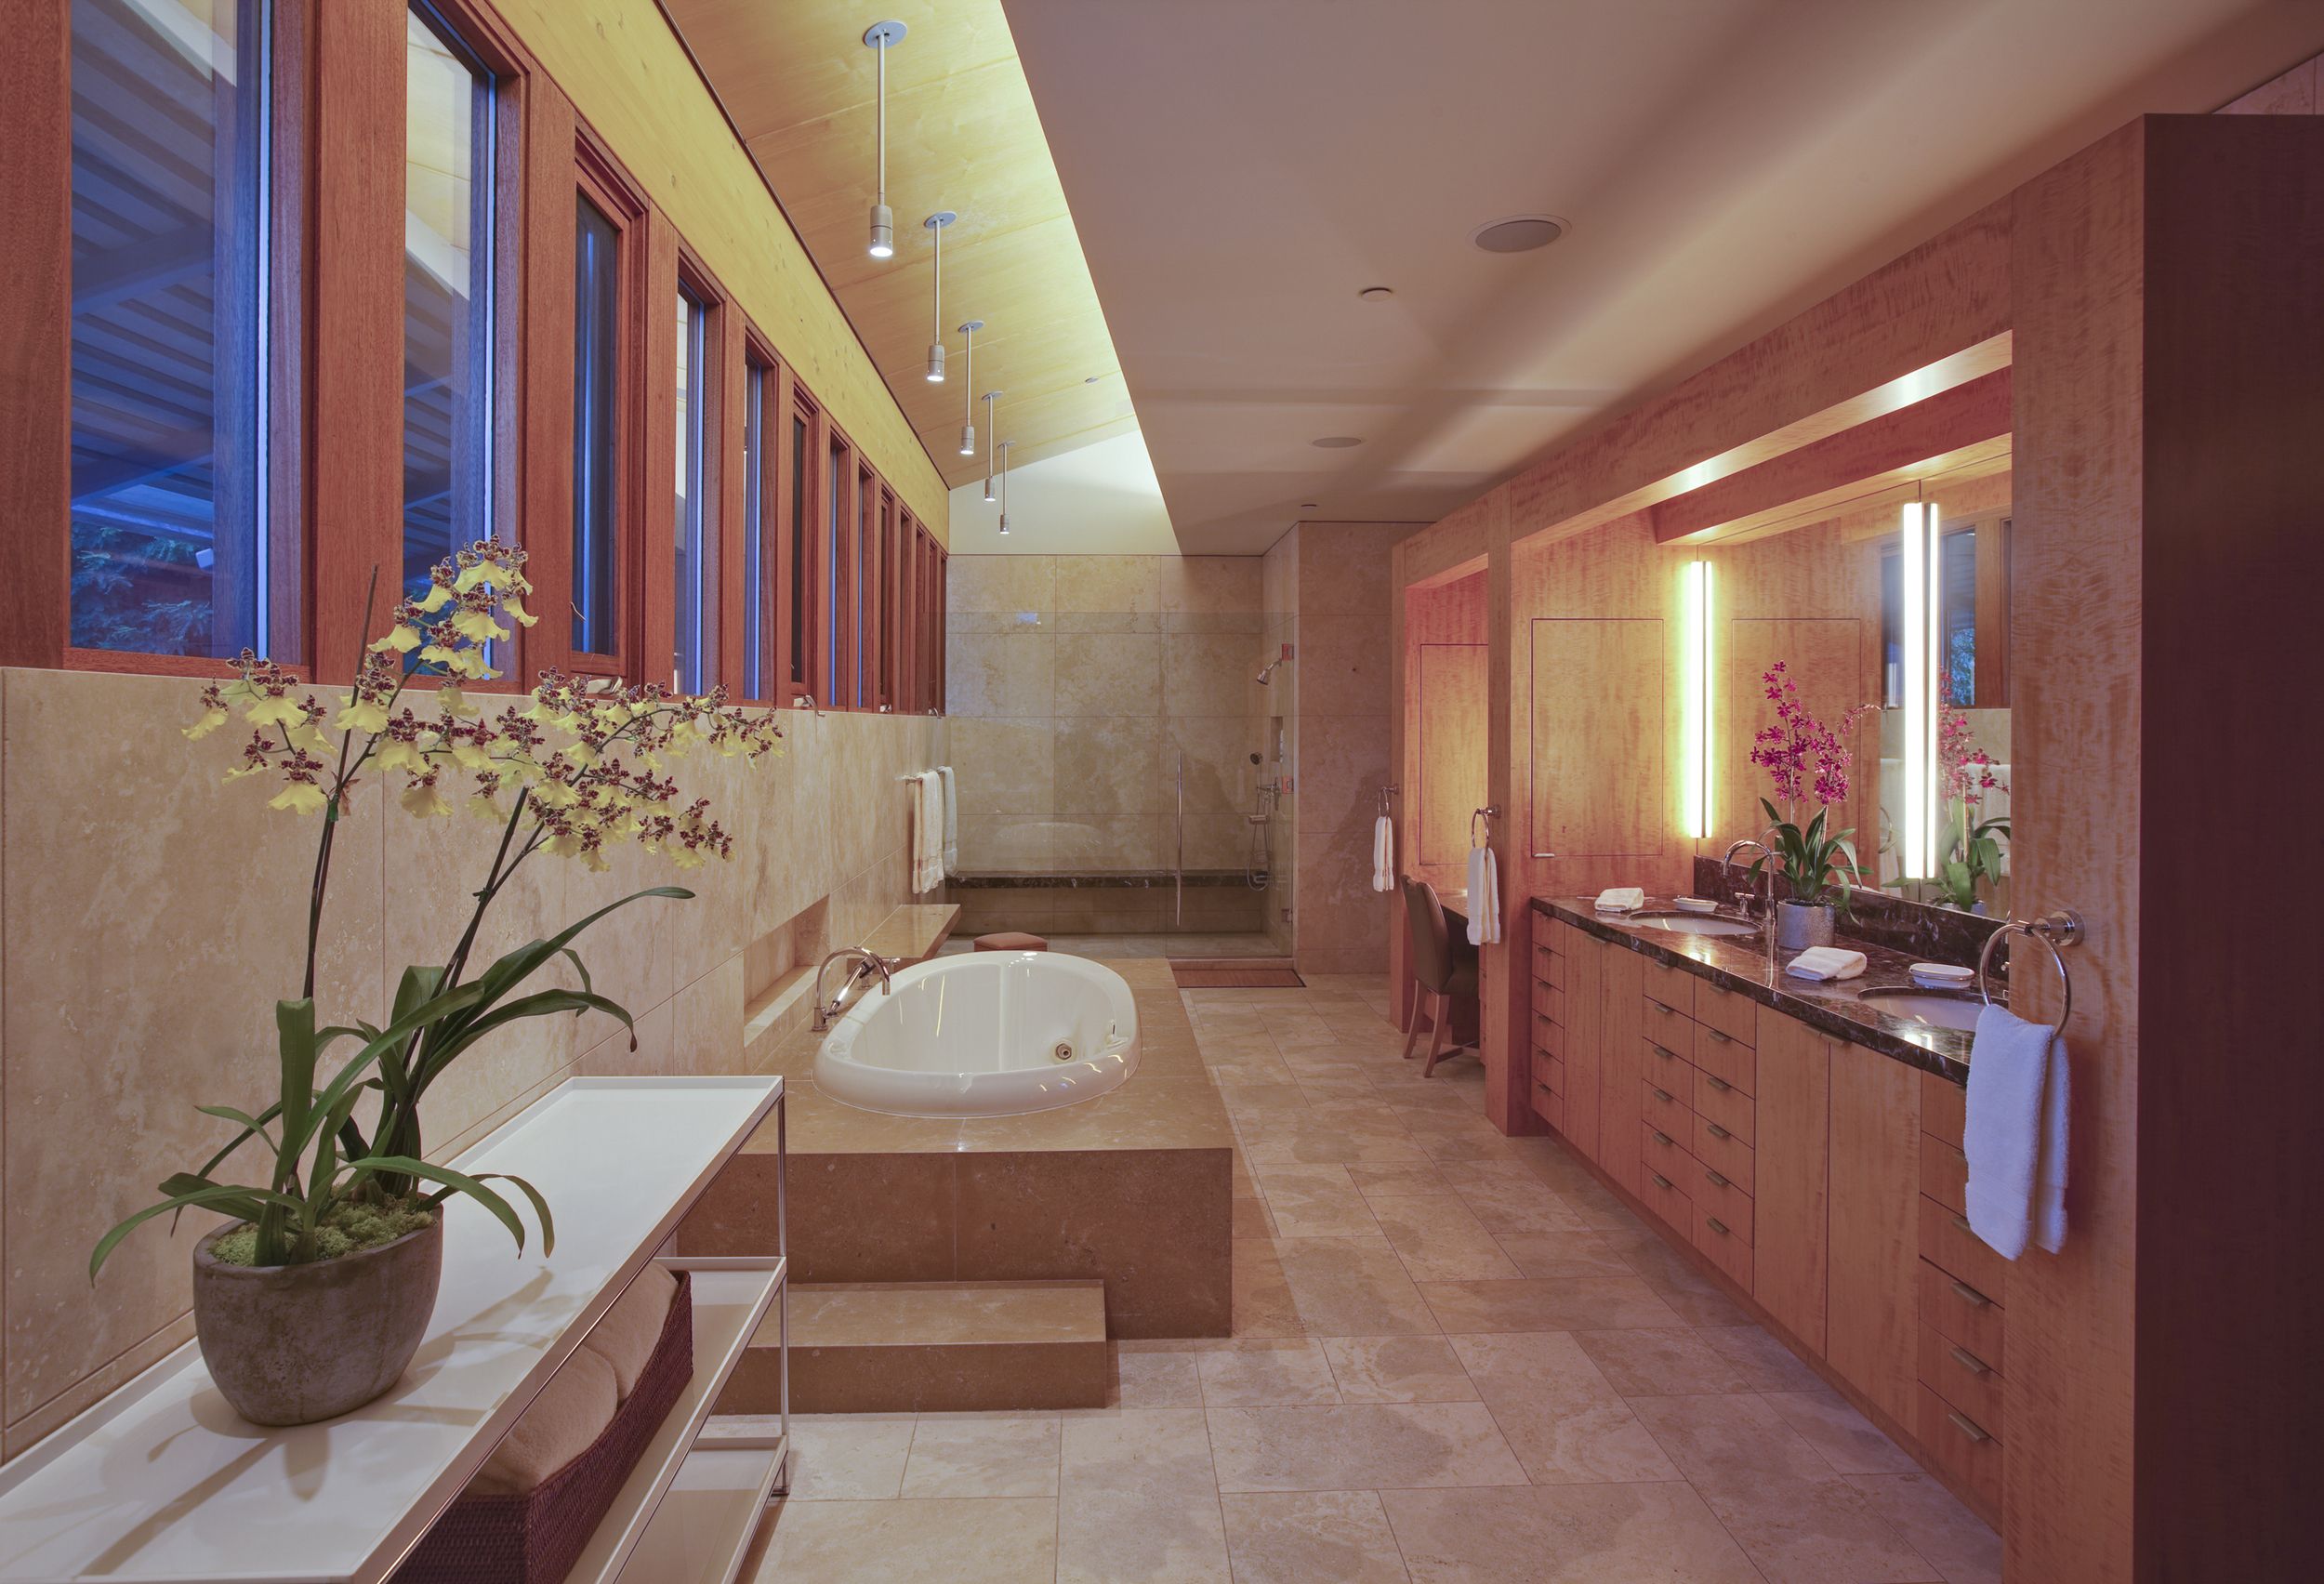 8-12M. Bath.jpg